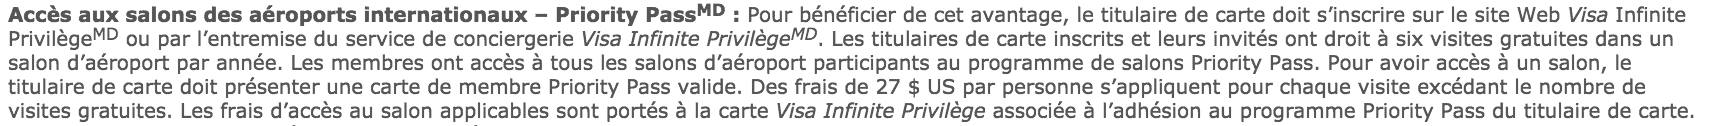 td infinite privilege priority pass